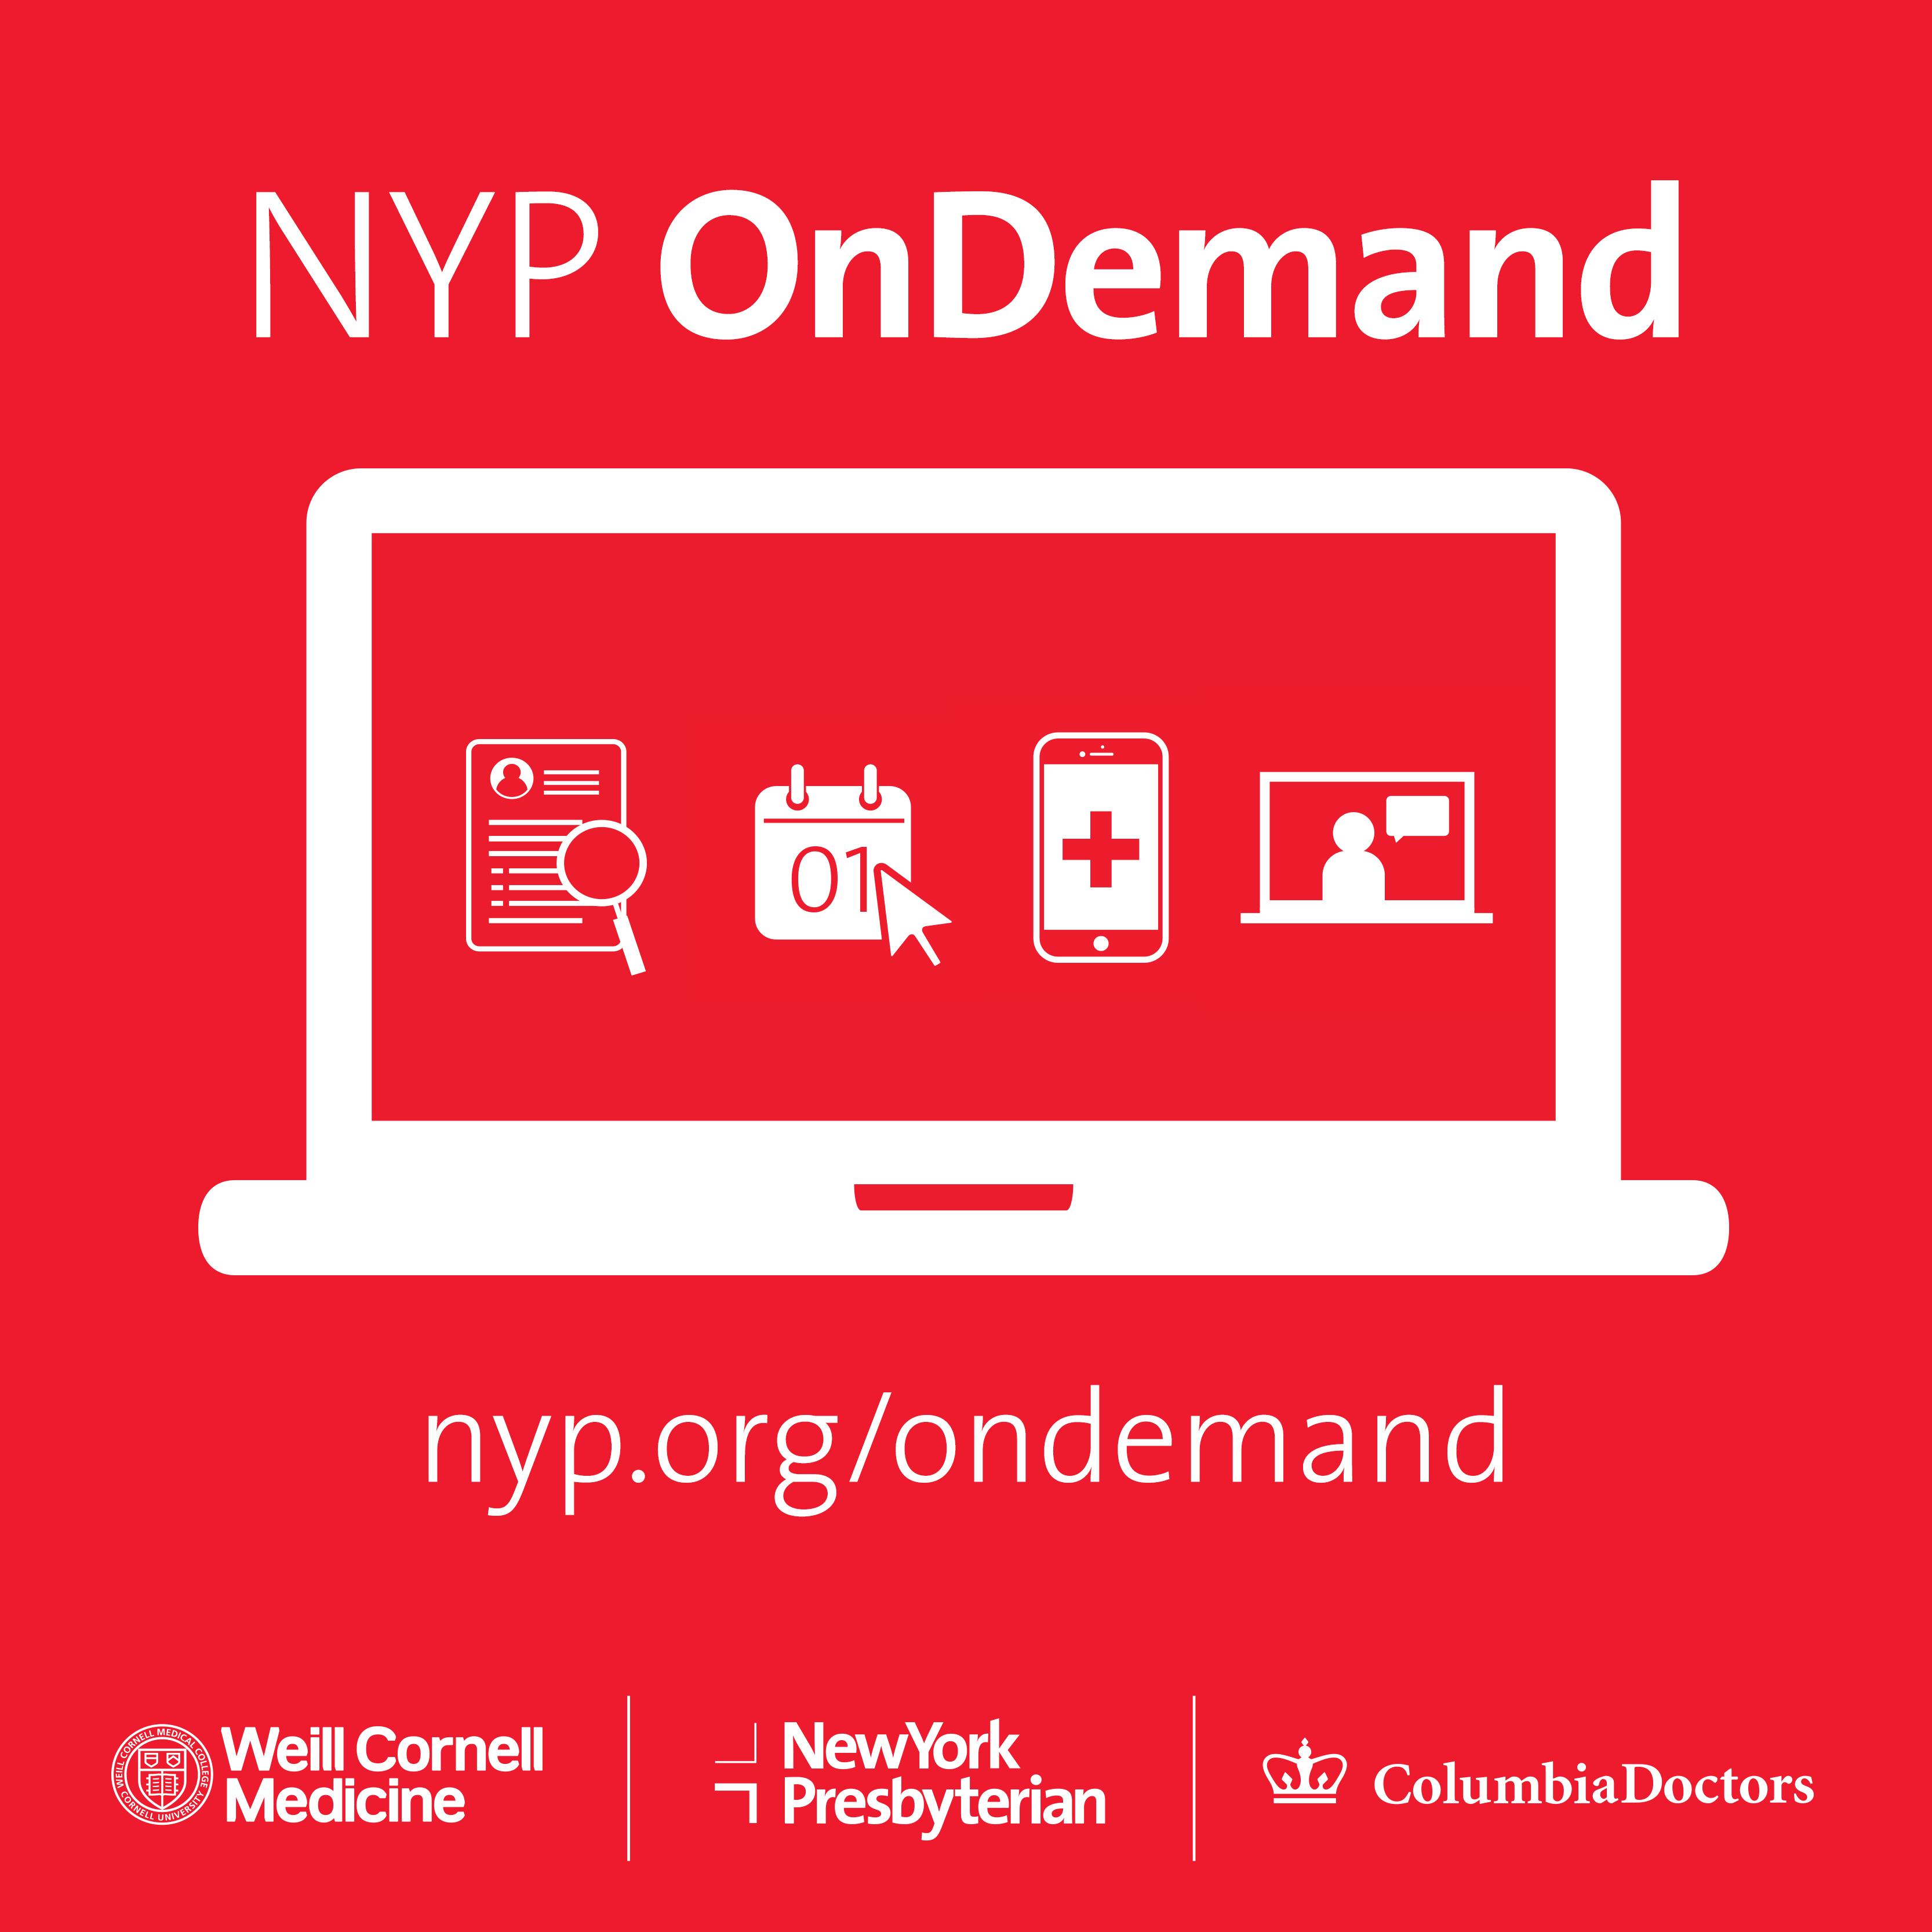 NYP OnDemand